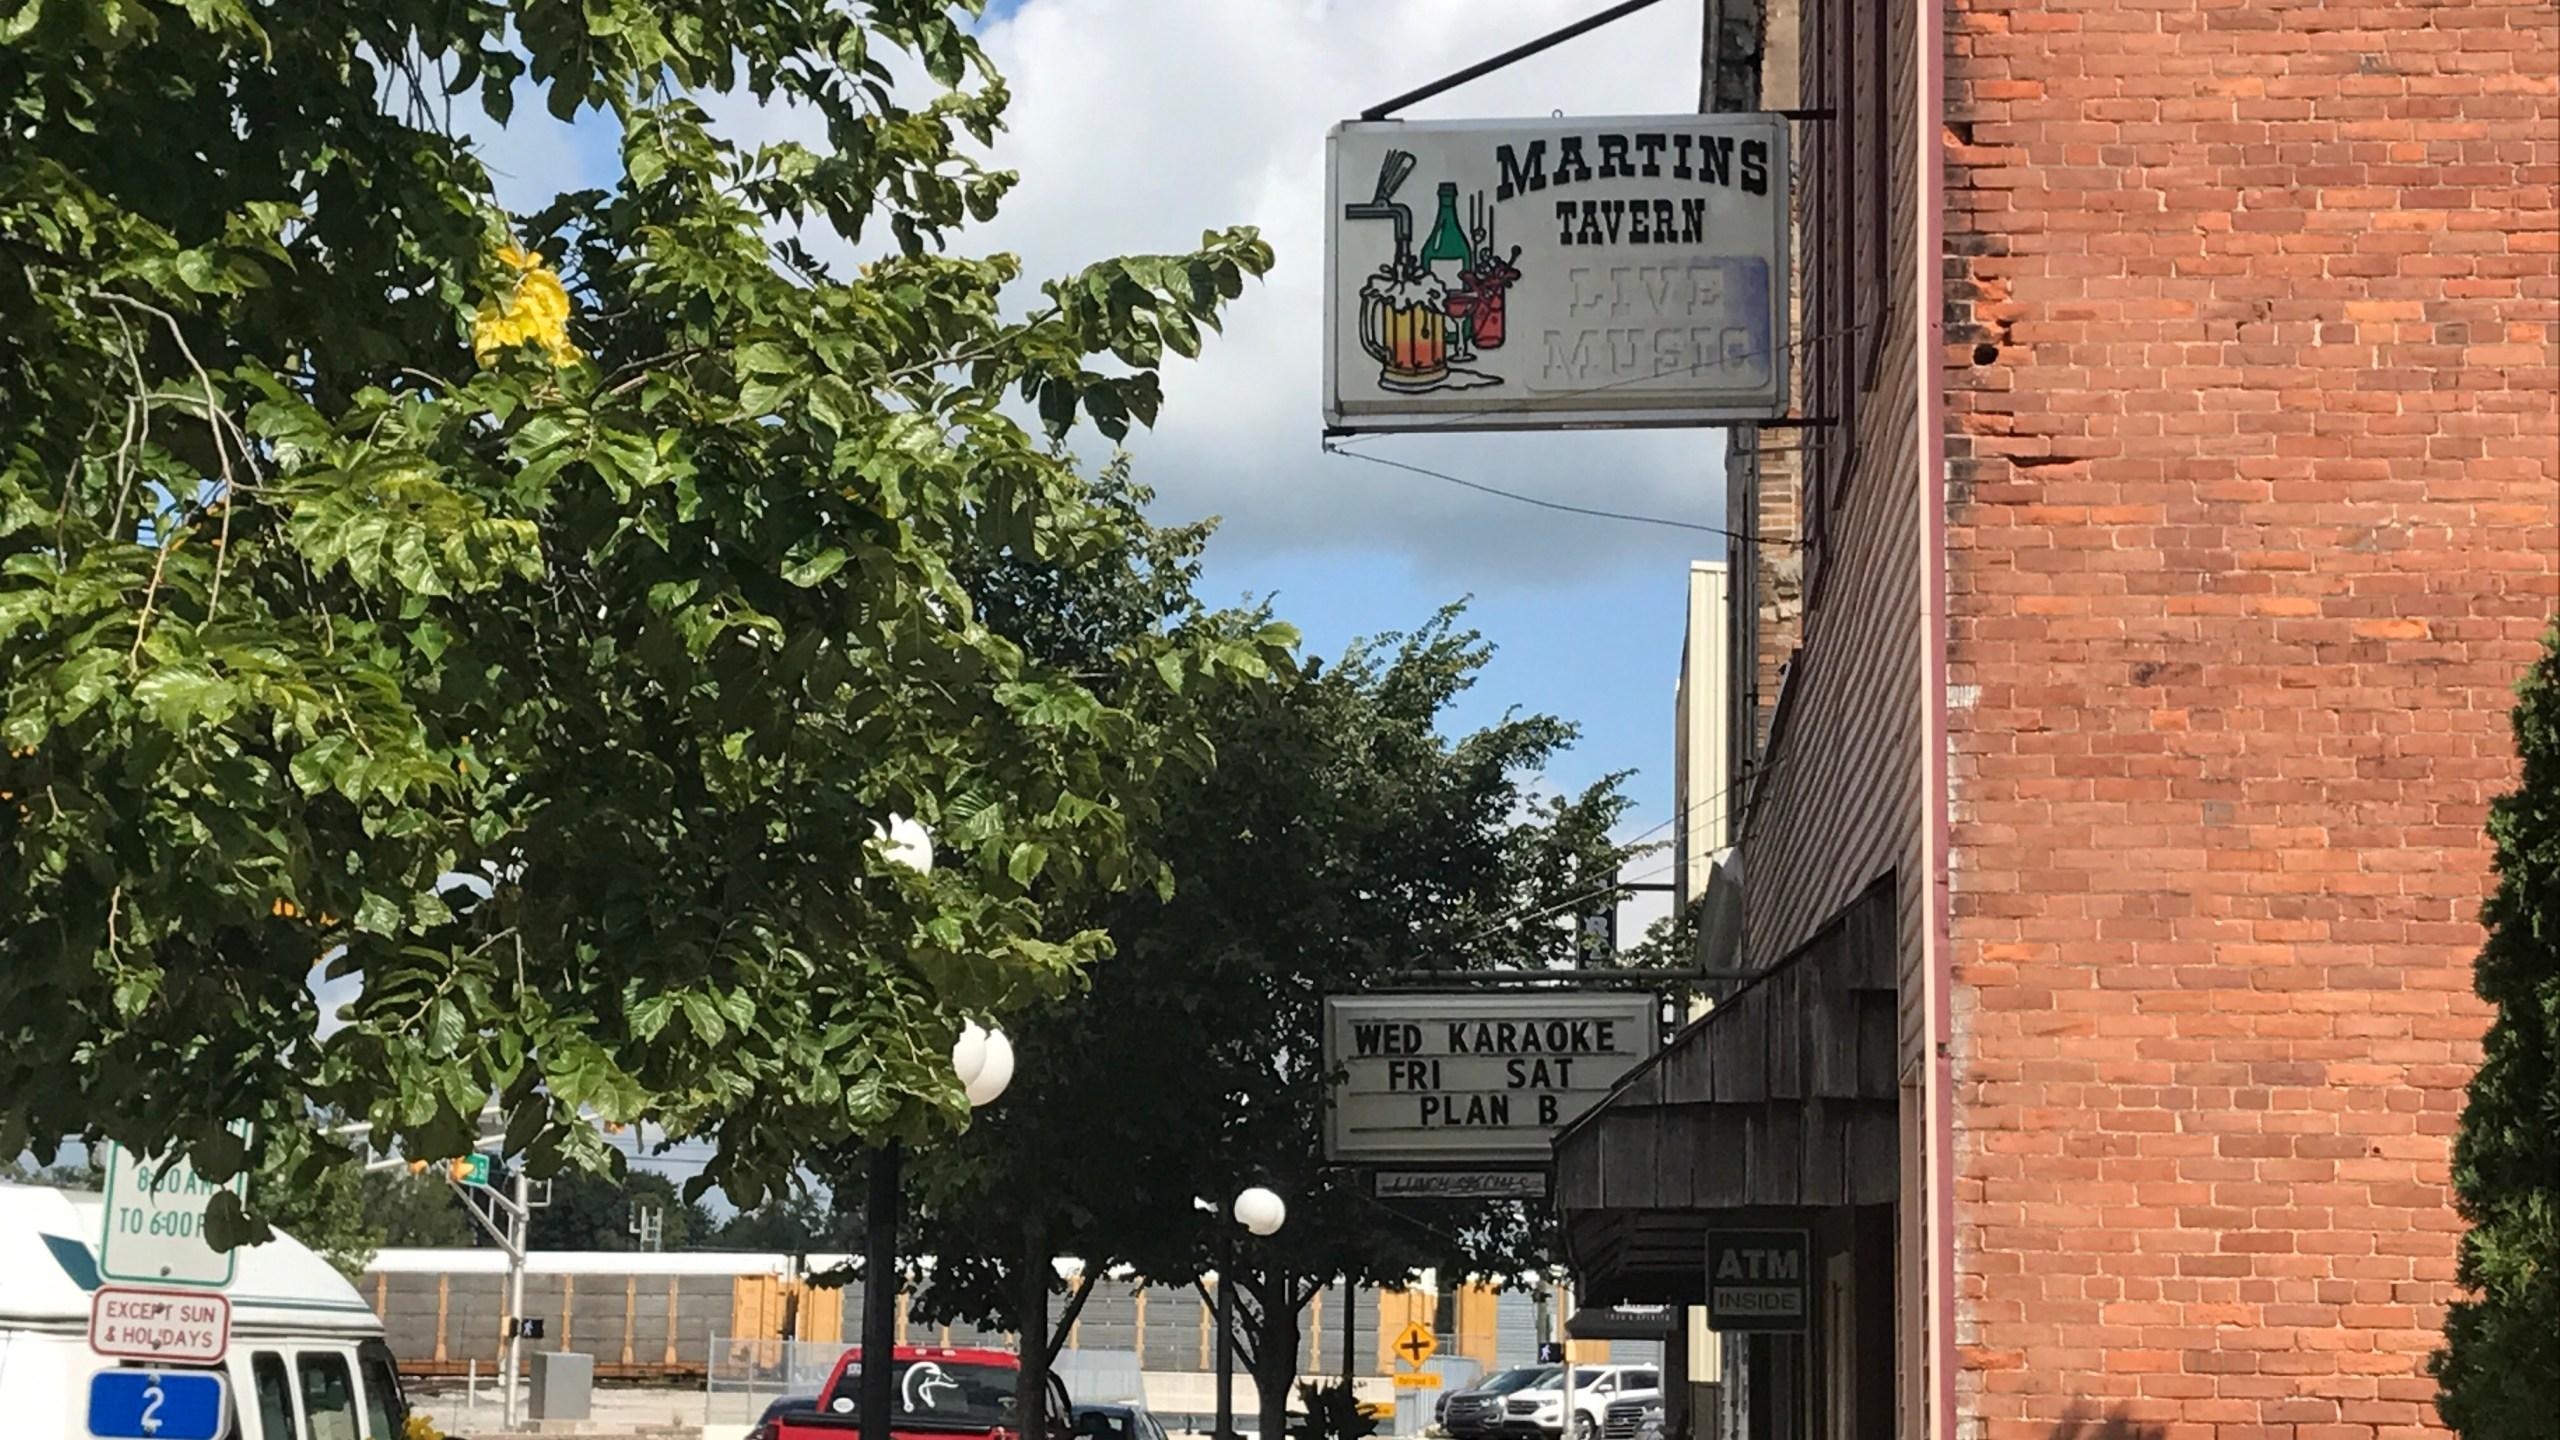 Martin's Tavern Garrett_281135